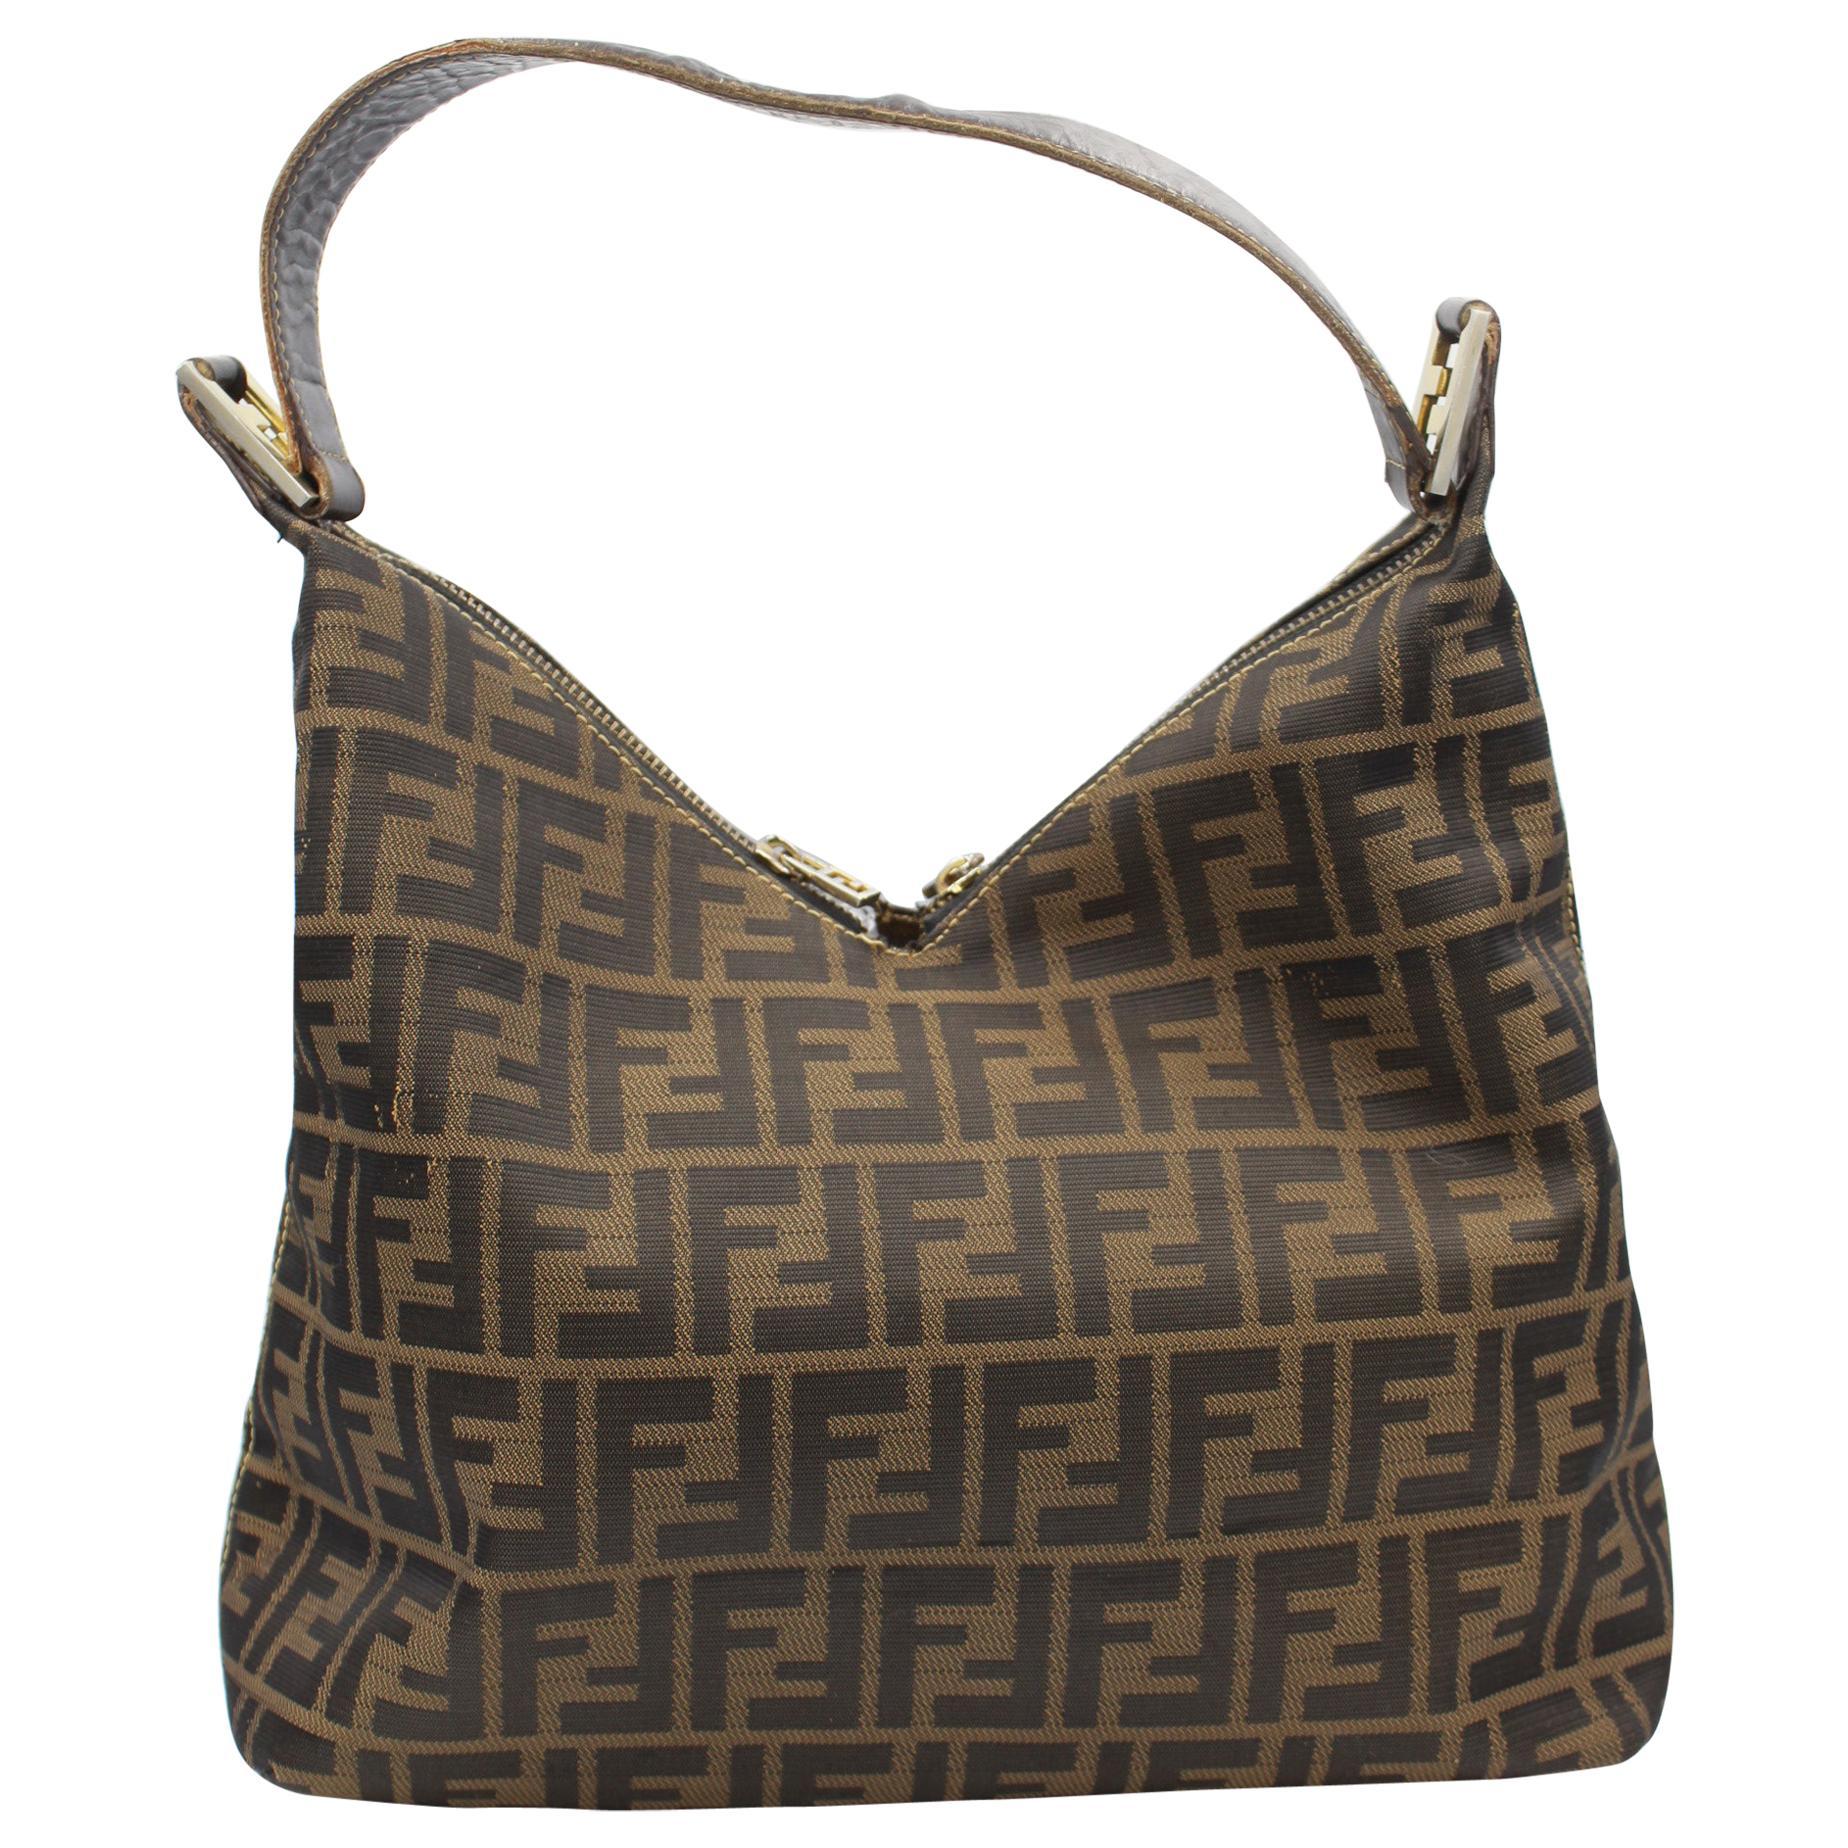 c6c4f54677 Vintage Fendi Top Handle Bags - 240 For Sale at 1stdibs